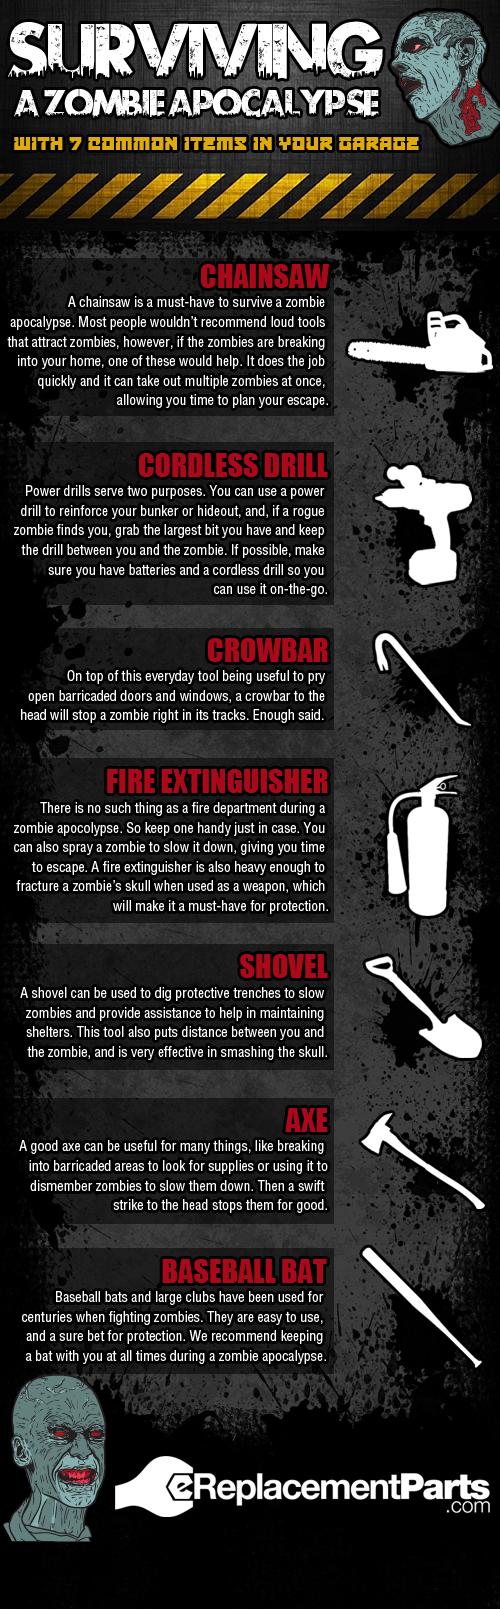 Zombie-instructograh-1